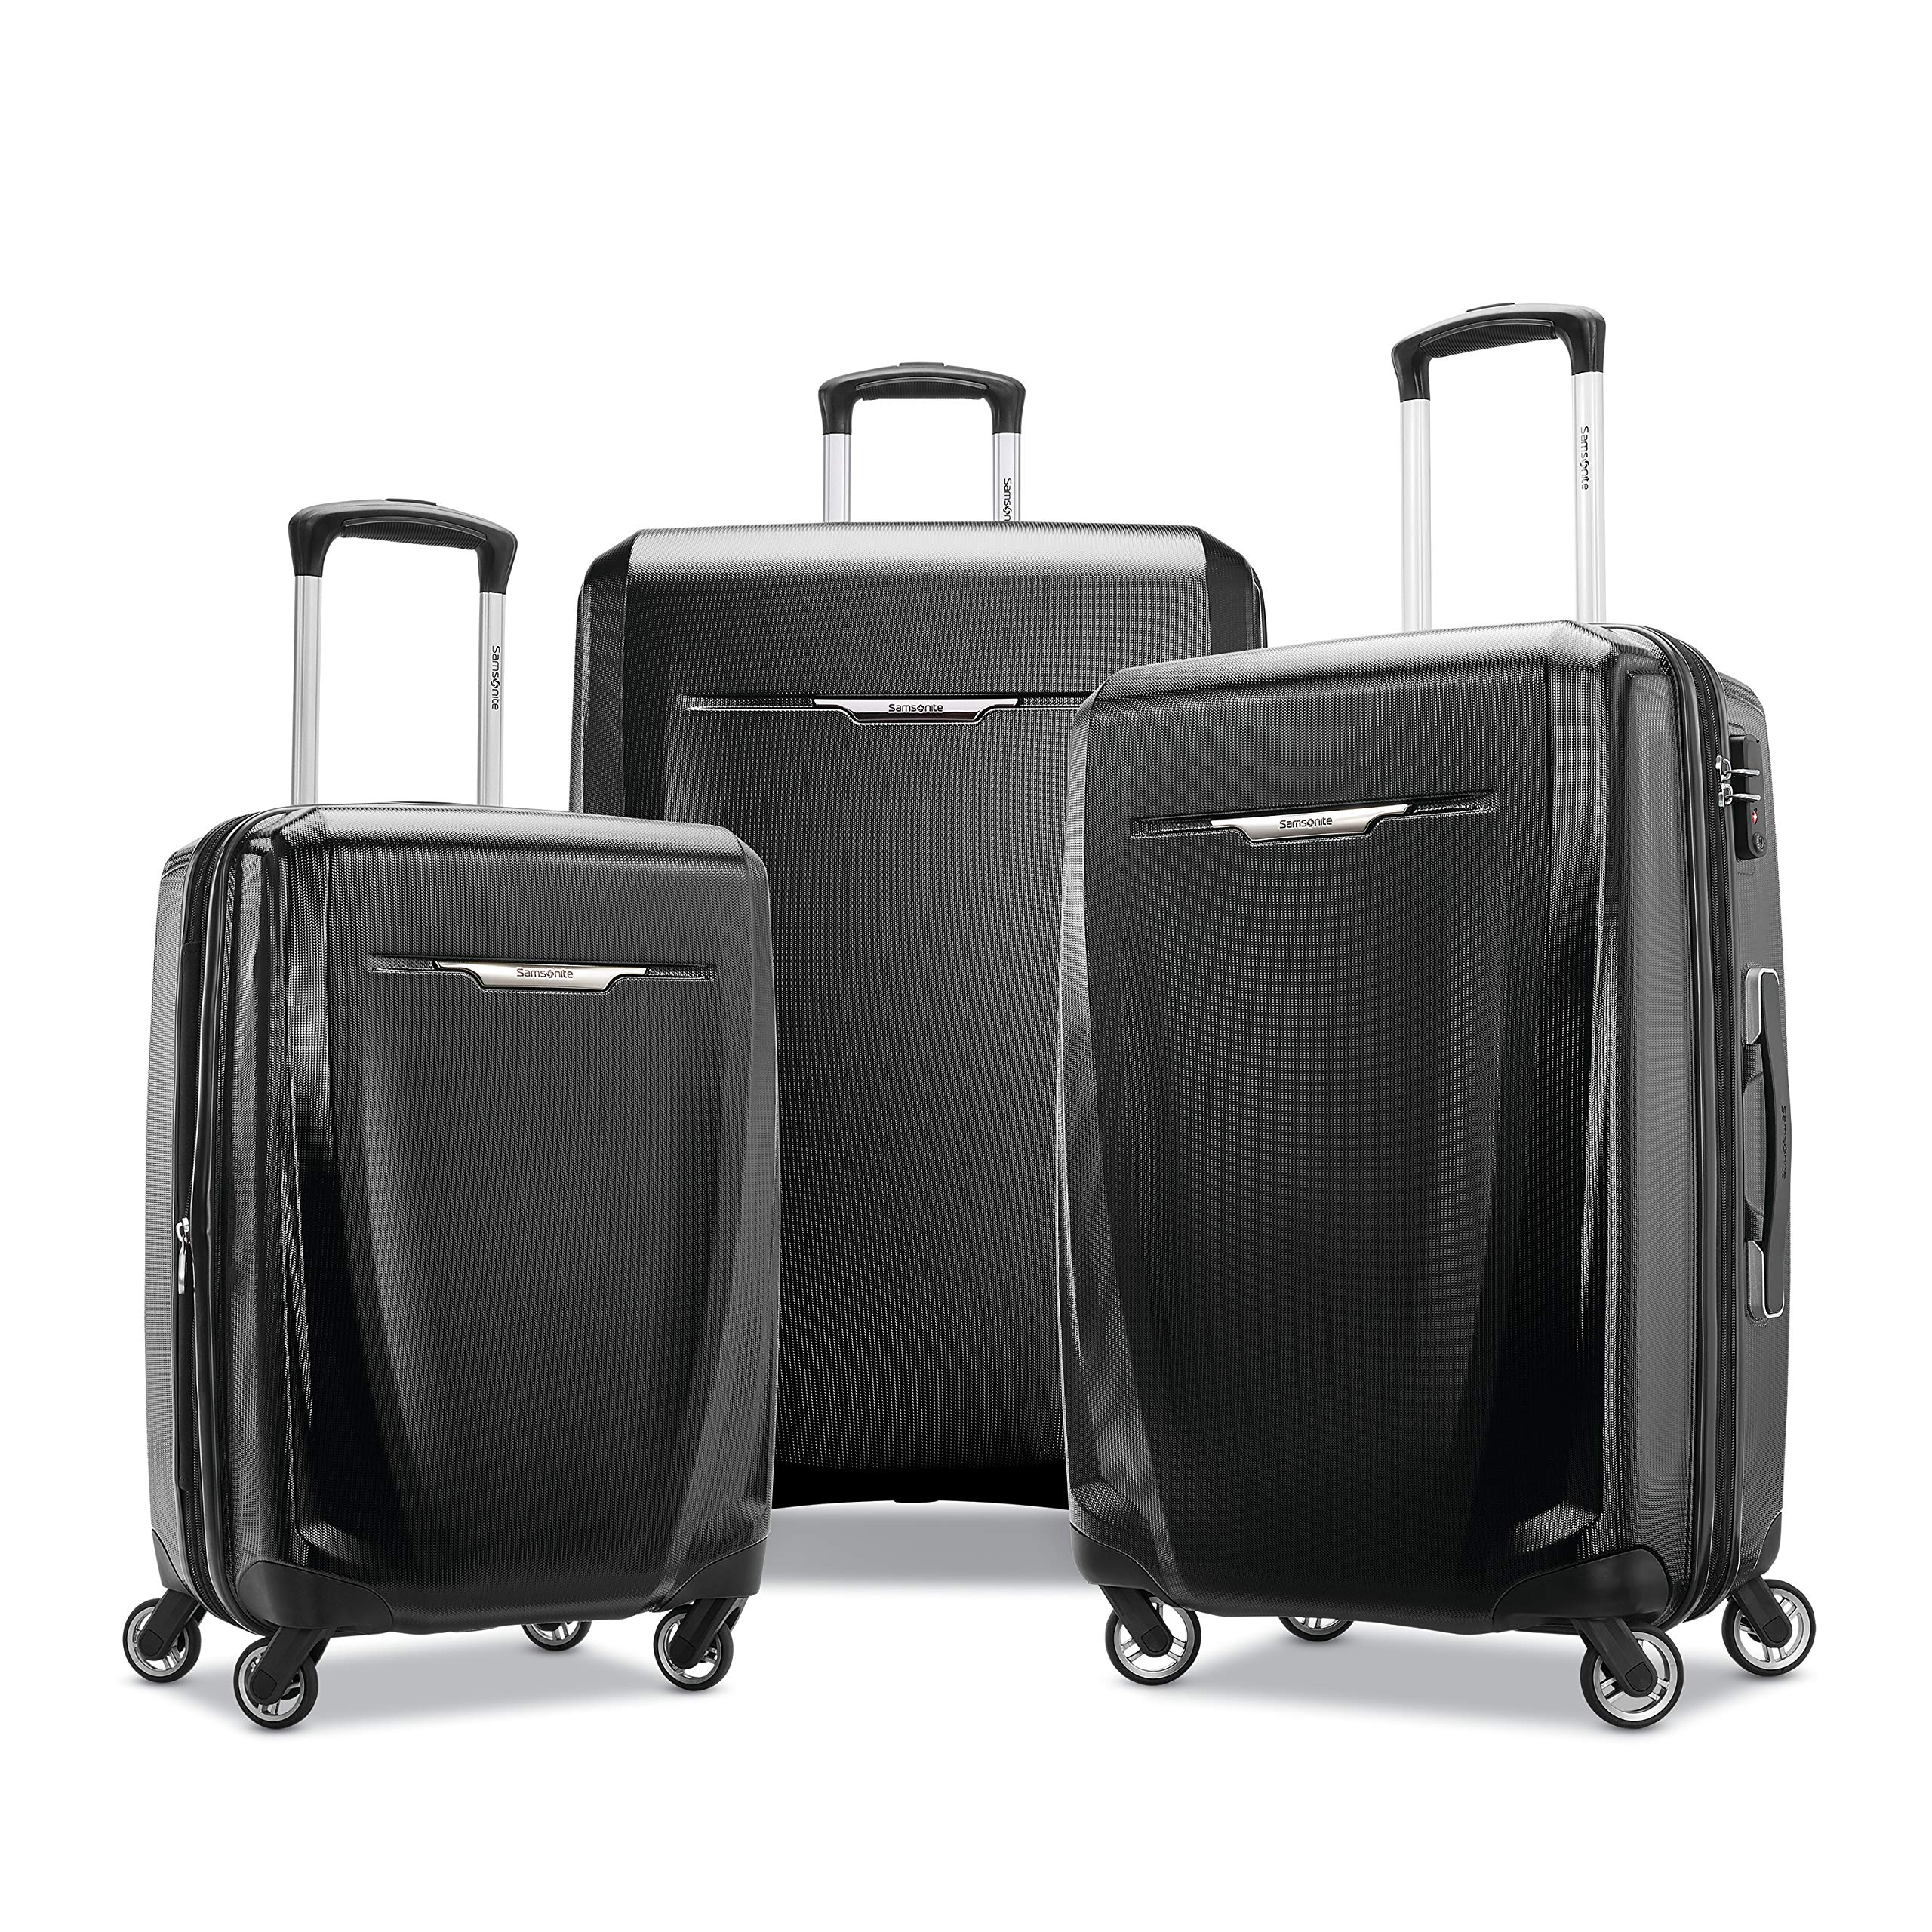 Samsonite Winfield Hardside Checked Luggage